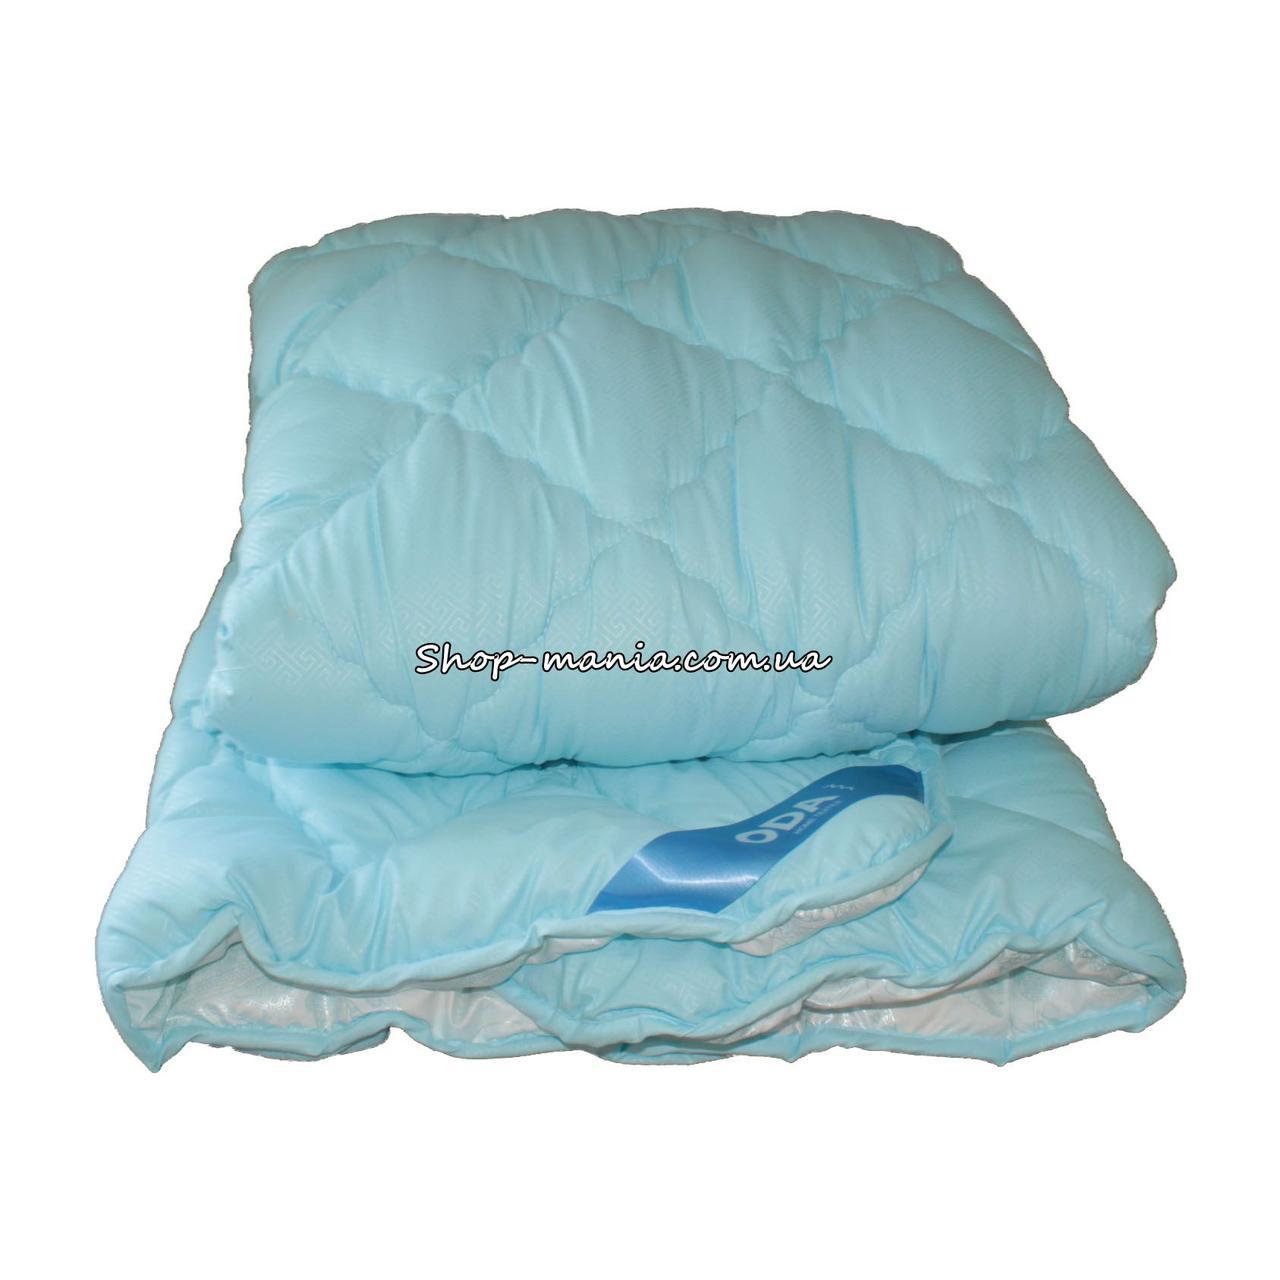 Одеяло зимнее теплое стеганное полуторное 155х210 см холлофайбер ODA SM 8009-1 blue and white